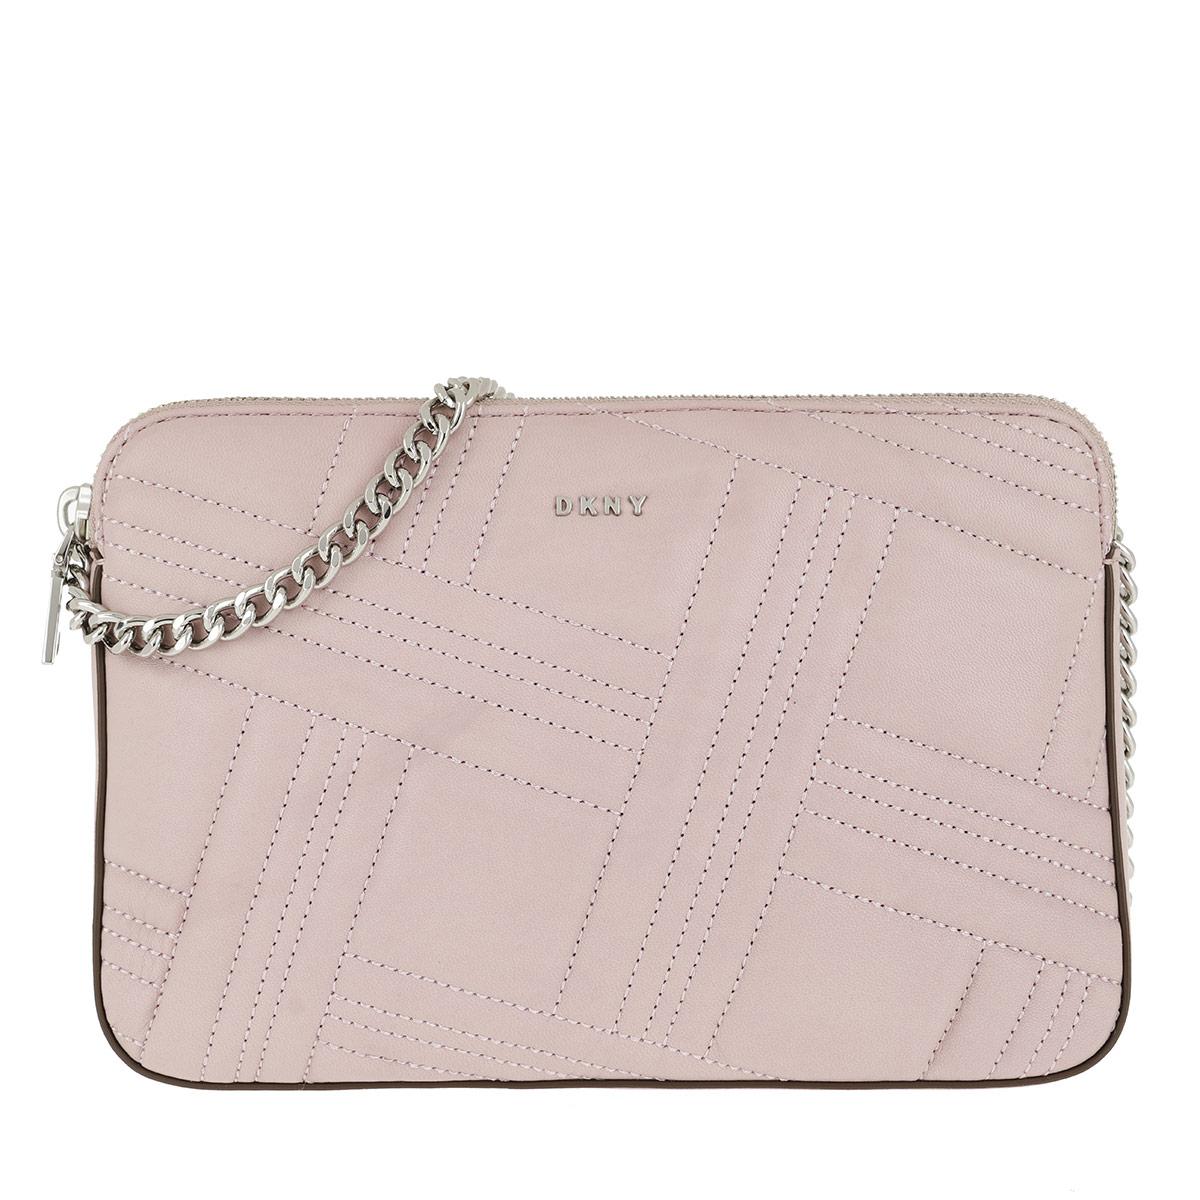 DKNY Umhängetasche - Allen MD Crossbody Bag Lavender - in lila - für Damen